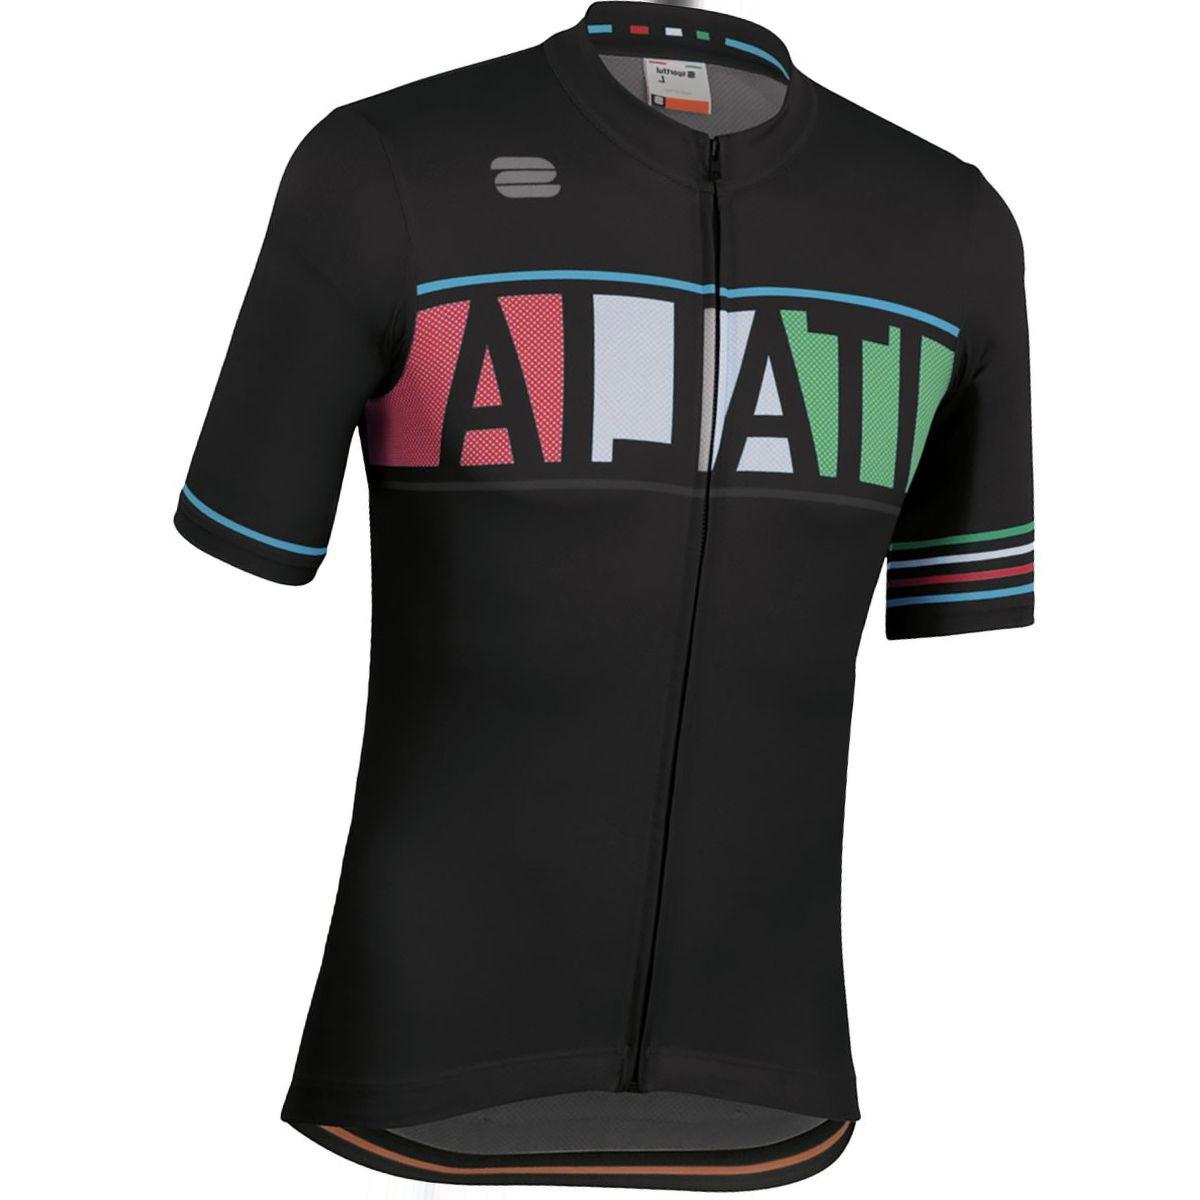 Sportful Italia Short-Sleeve Jersey - Men's